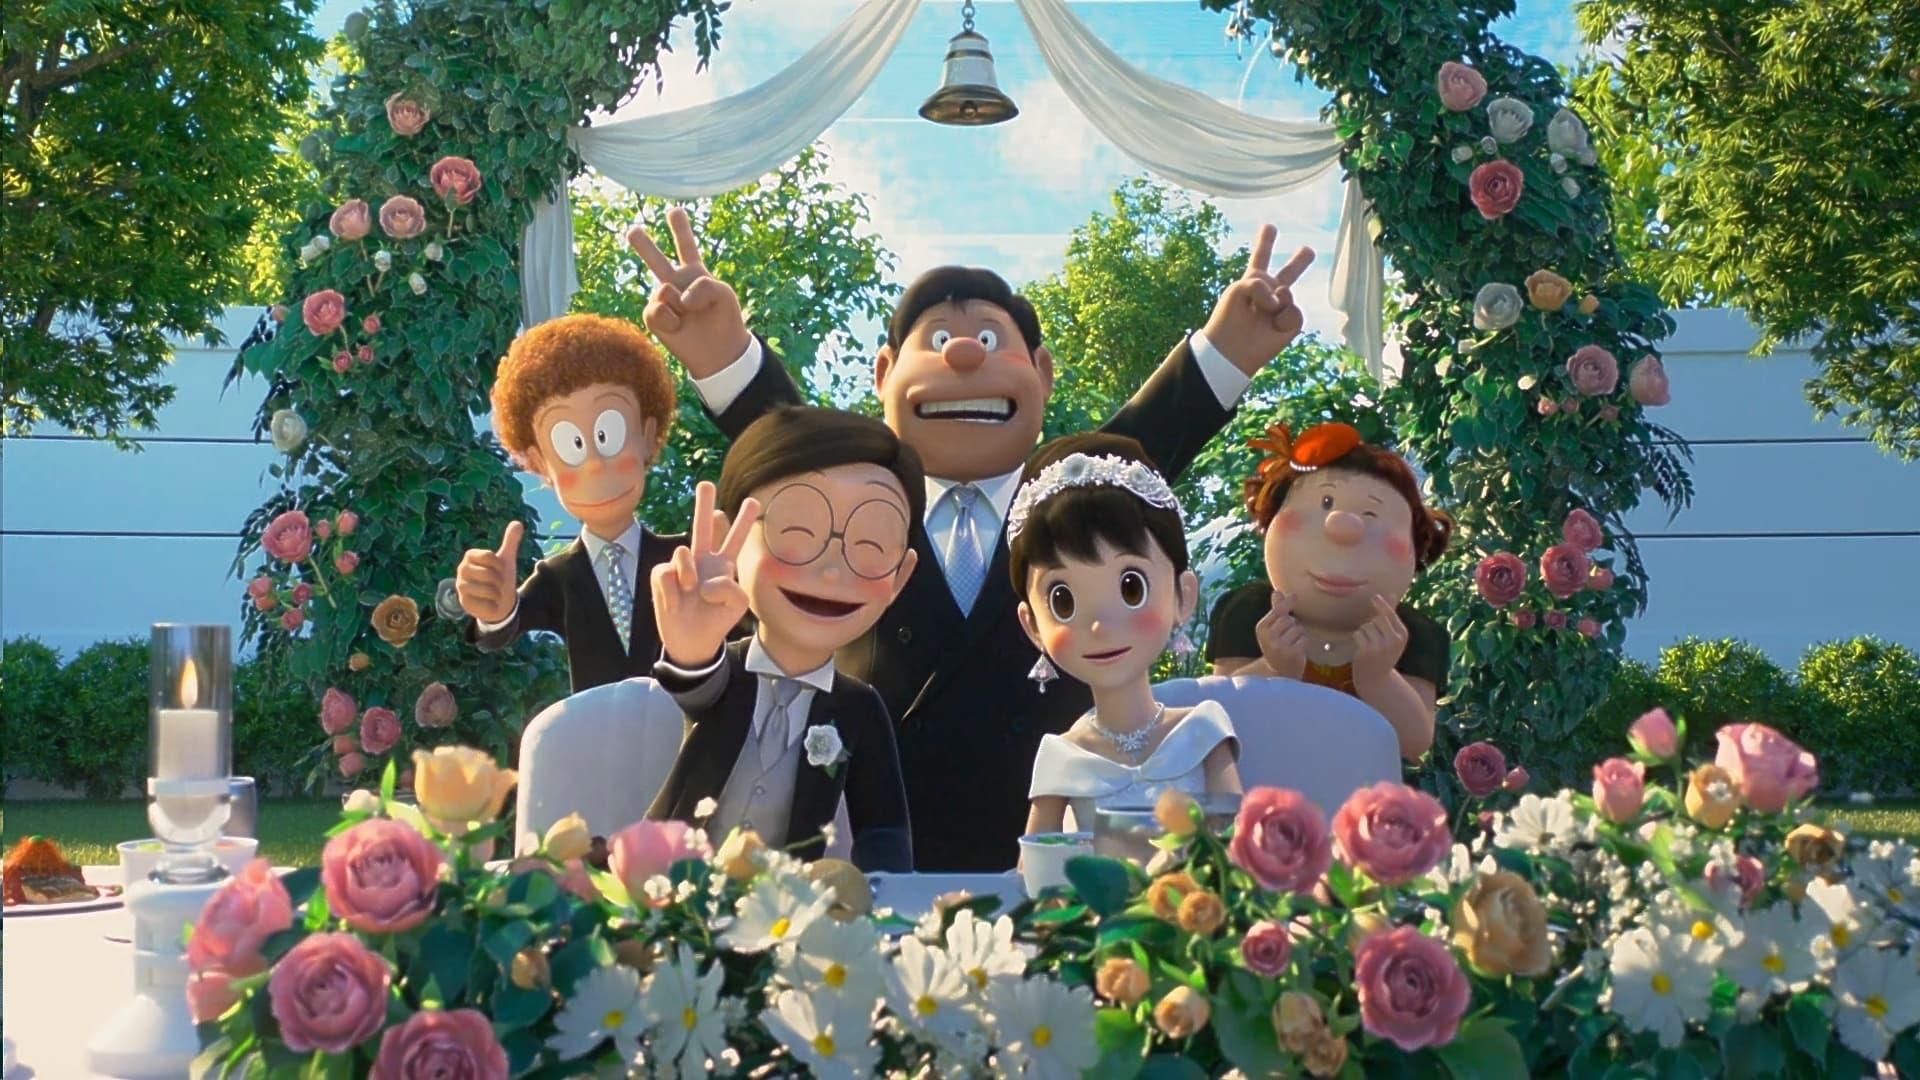 Stand by Me Doraemon 2 (2020) Movie English Full Movie Watch Online Free